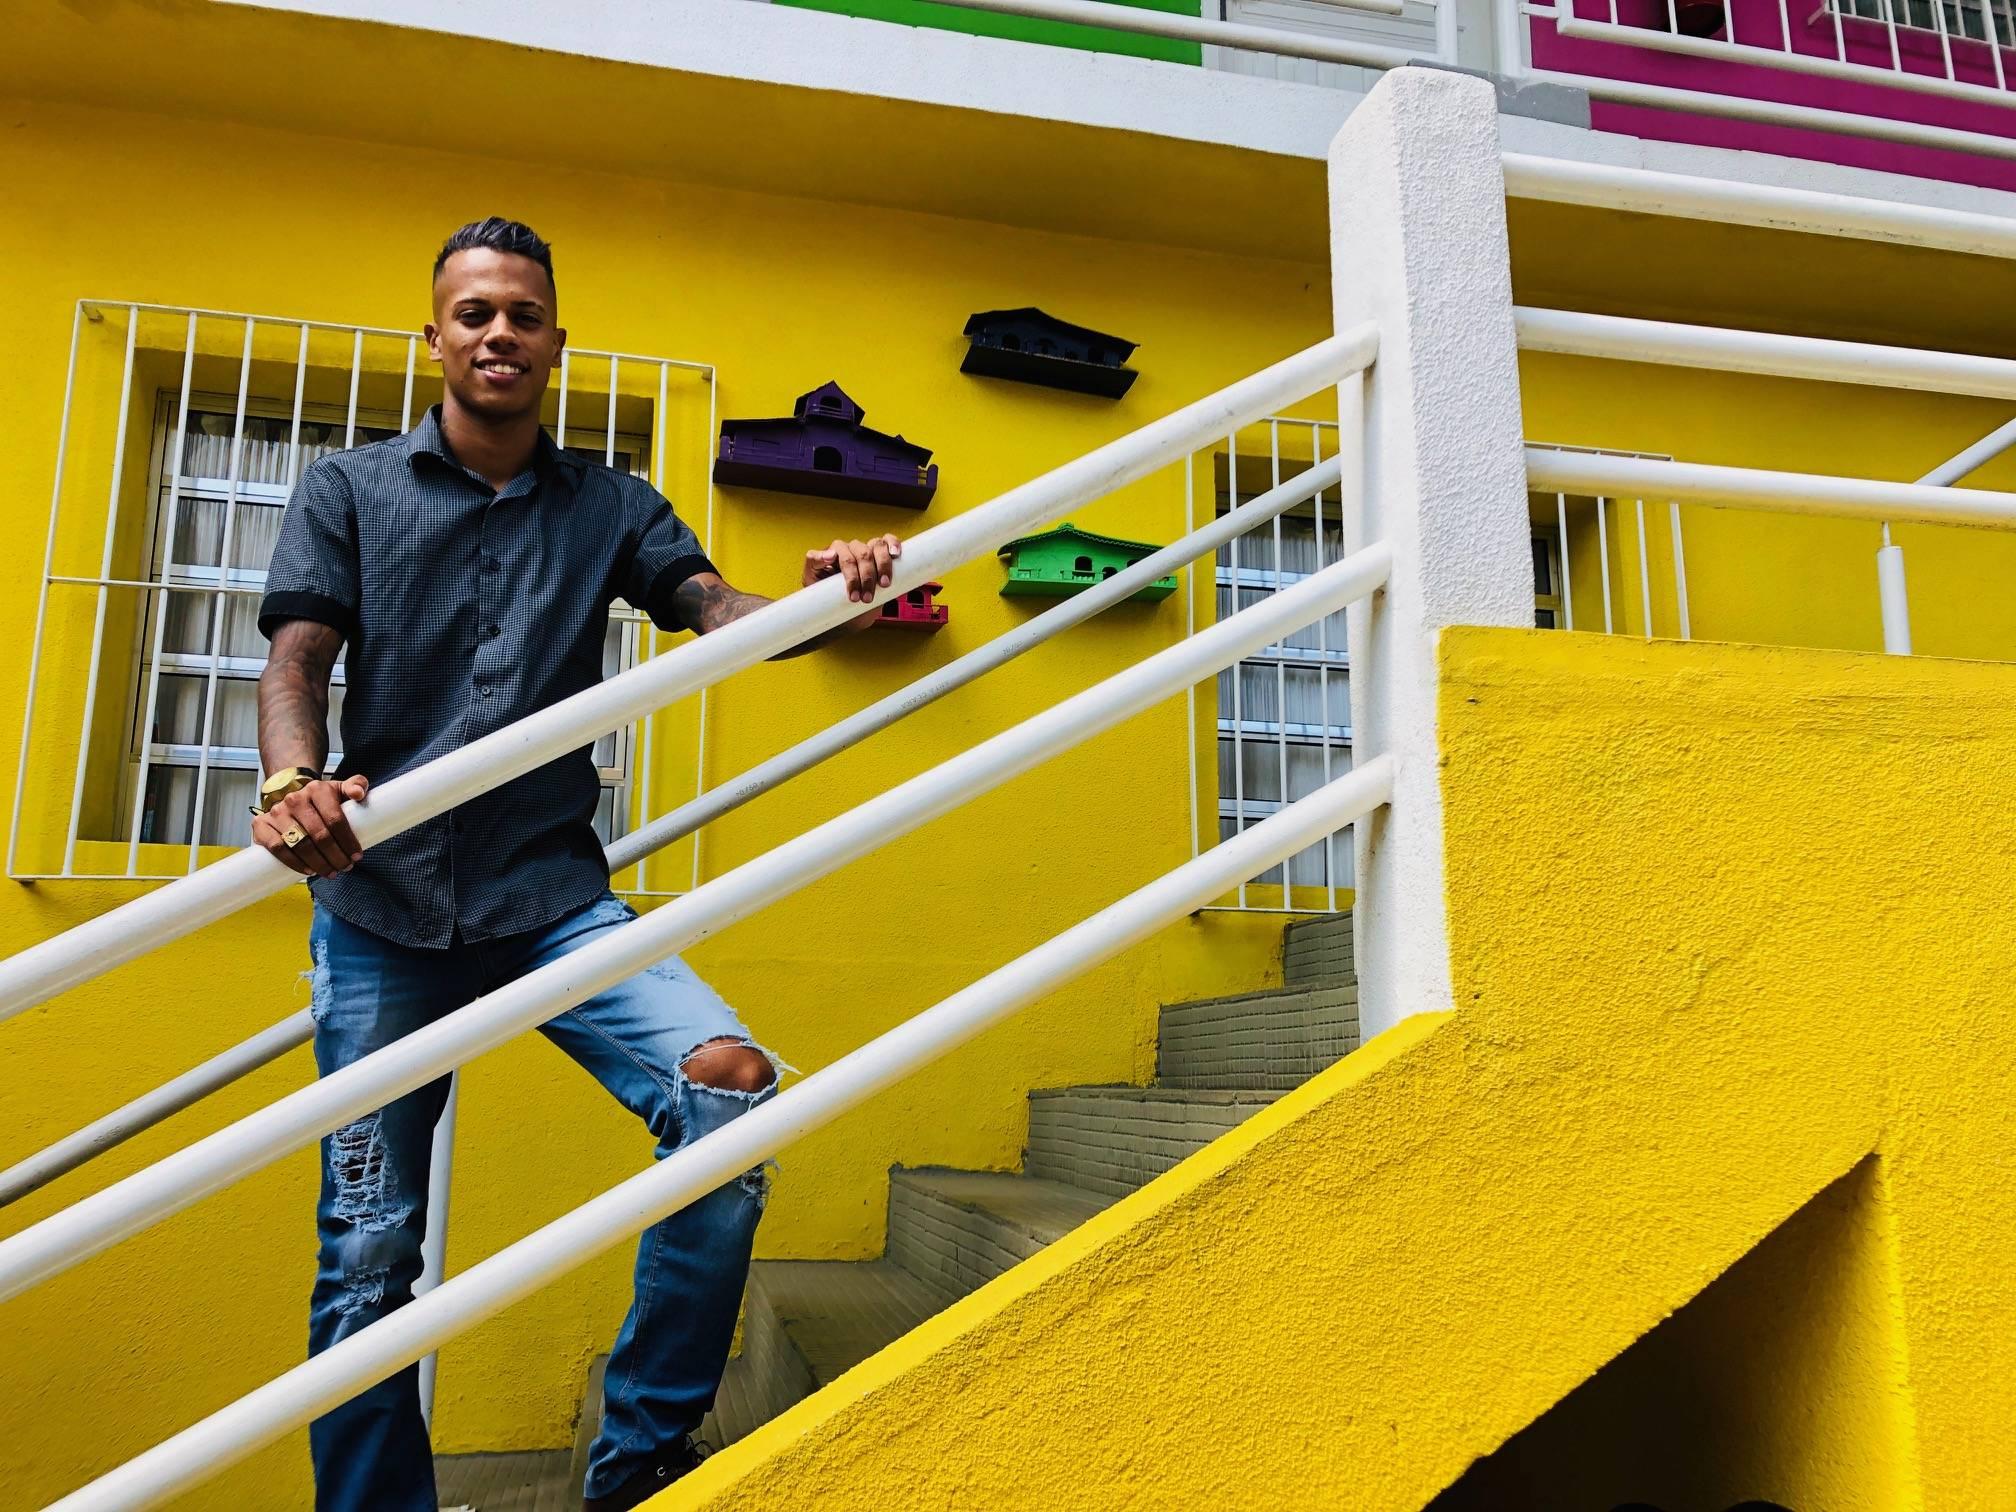 www.juicysantos.com.br - vila criativa - ex-aluno kaique oliveira